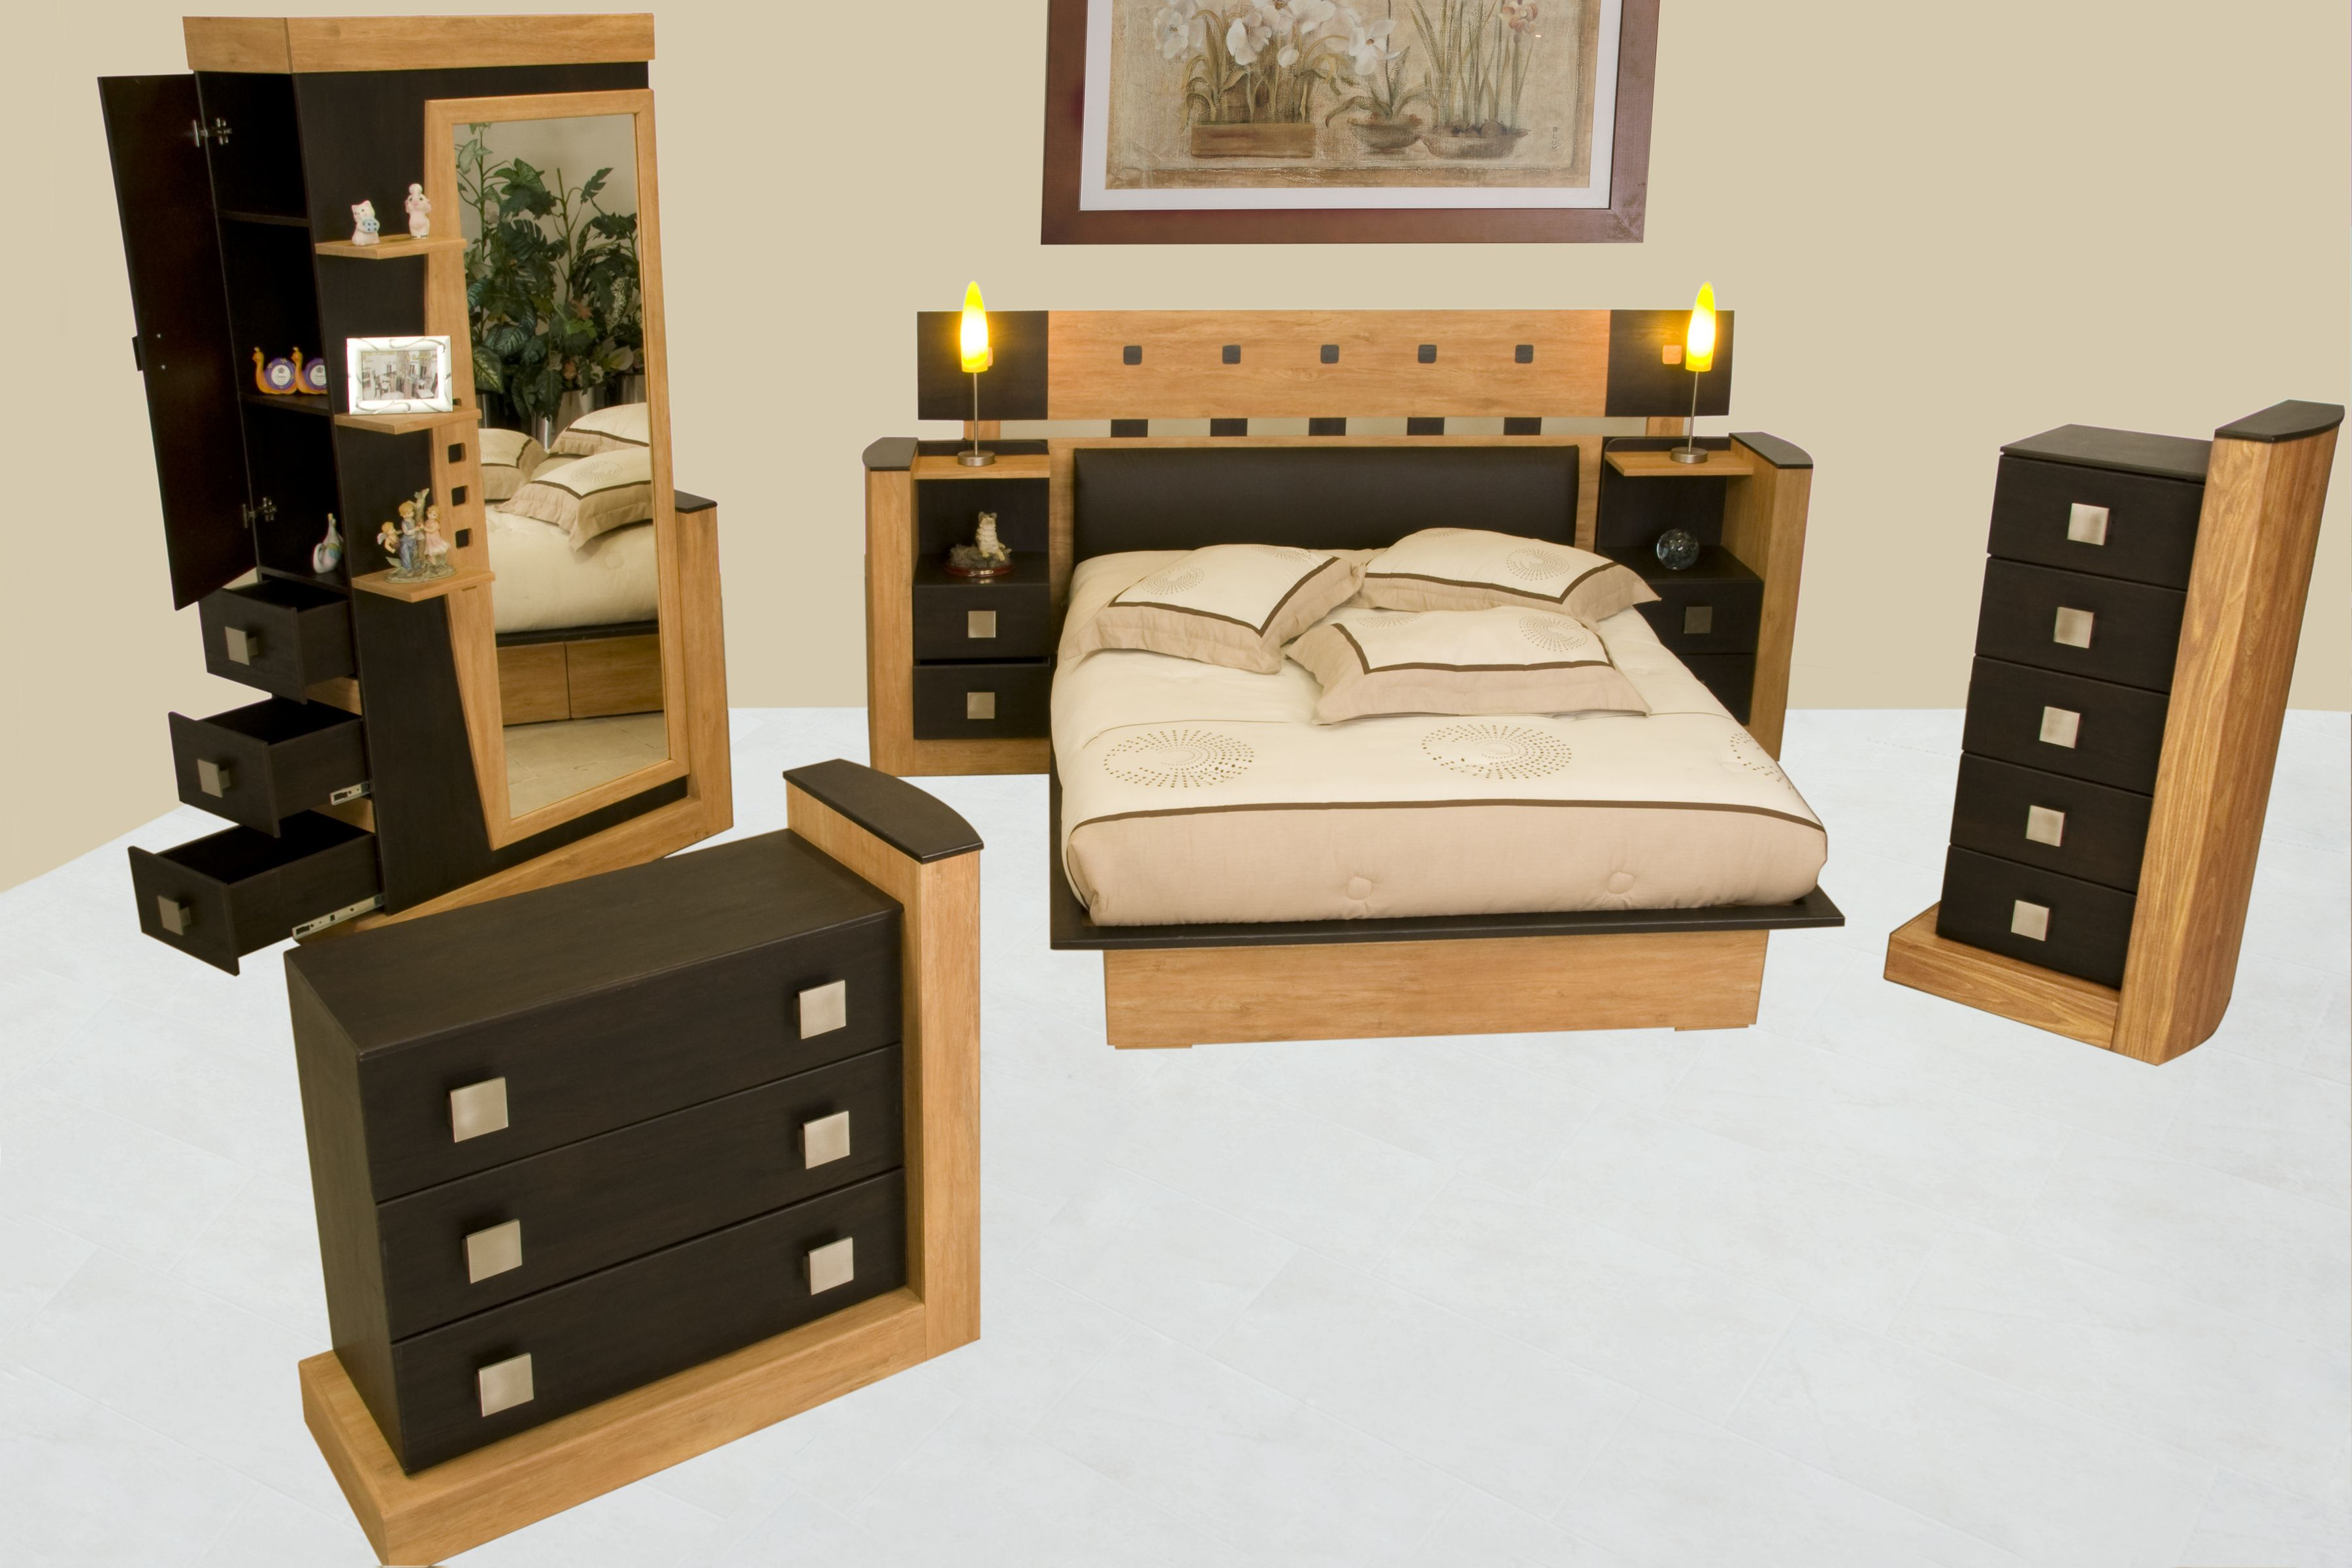 Recamara 4 pzas kenia muebles troncosomuebles troncoso for Muebles para cafeteria